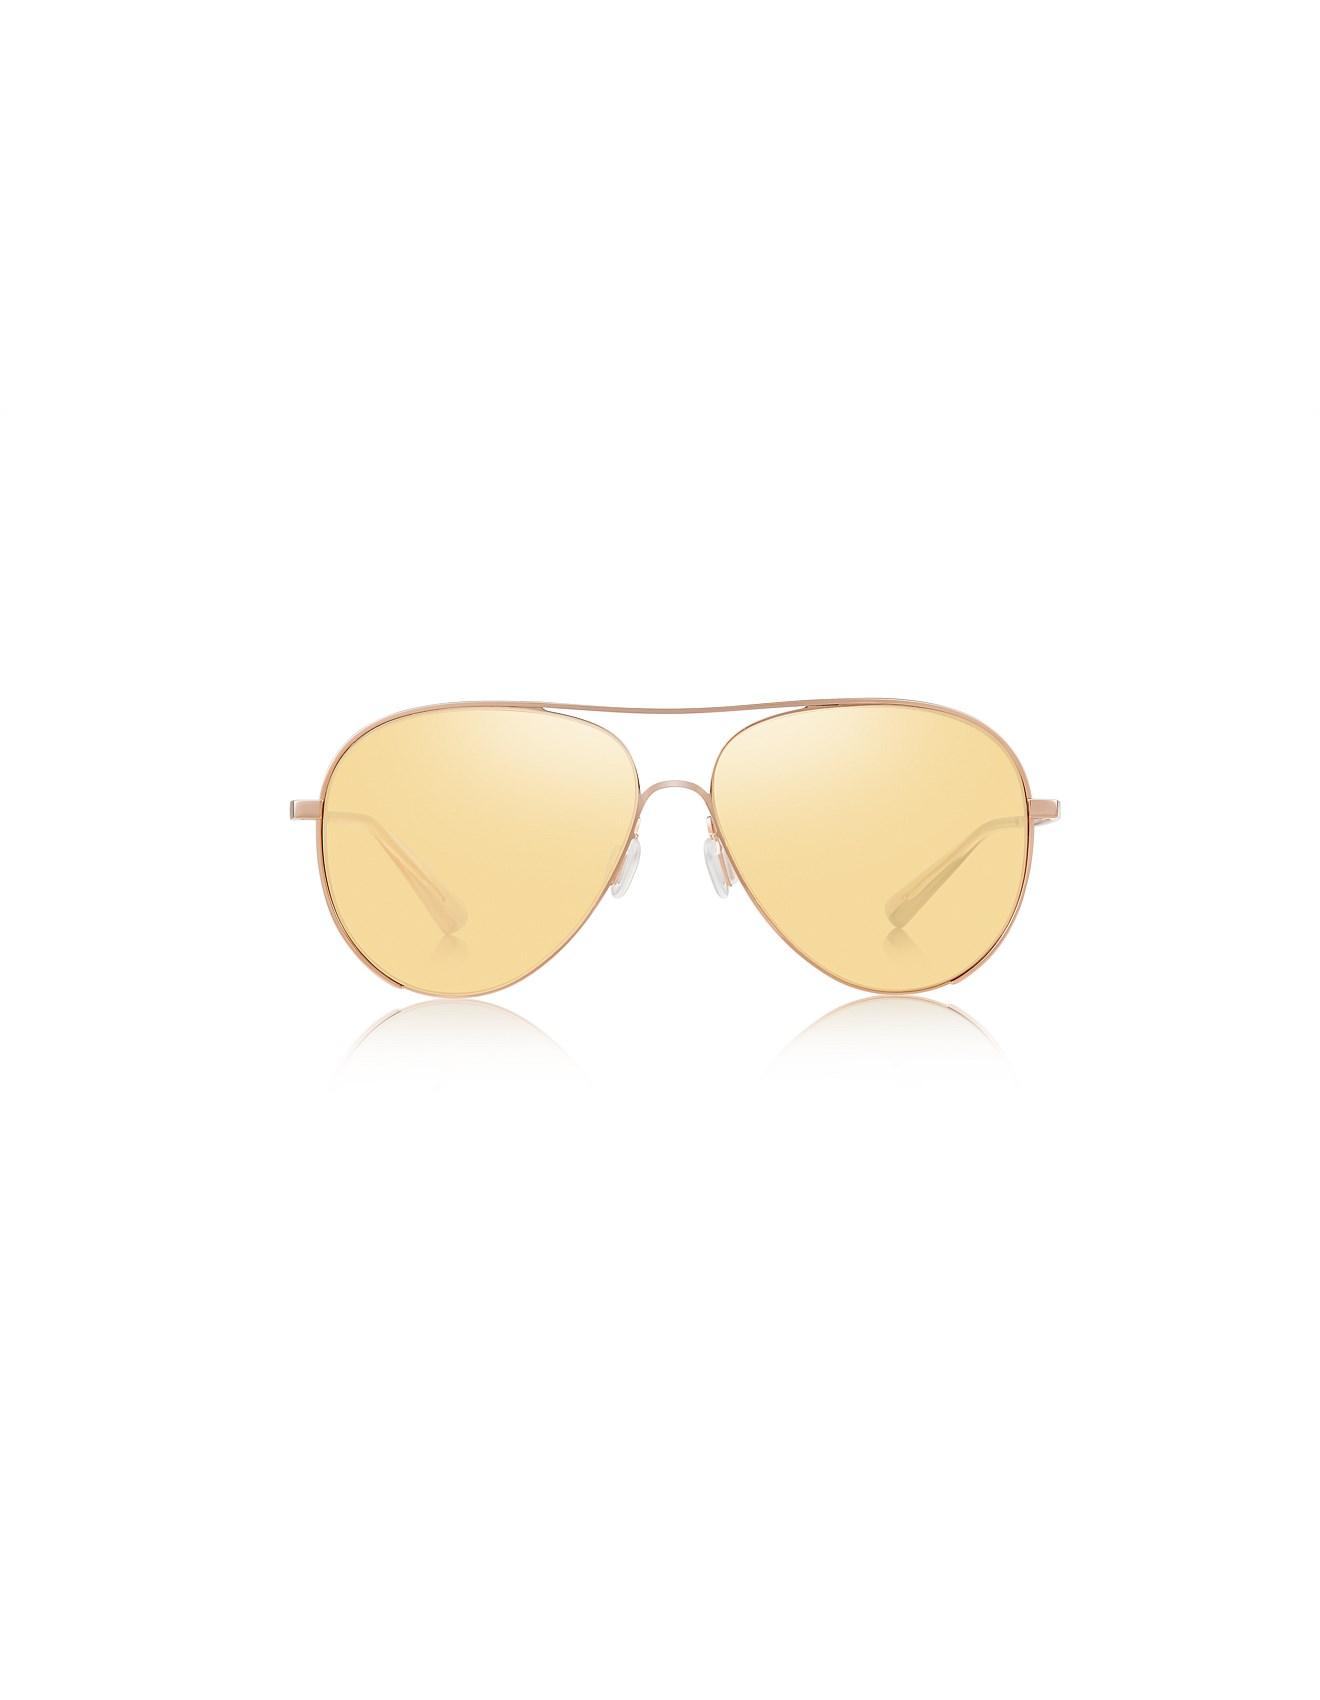 6e1f15ff93eb Bolon Eyewear - Legend Imperial Style Sunglasses